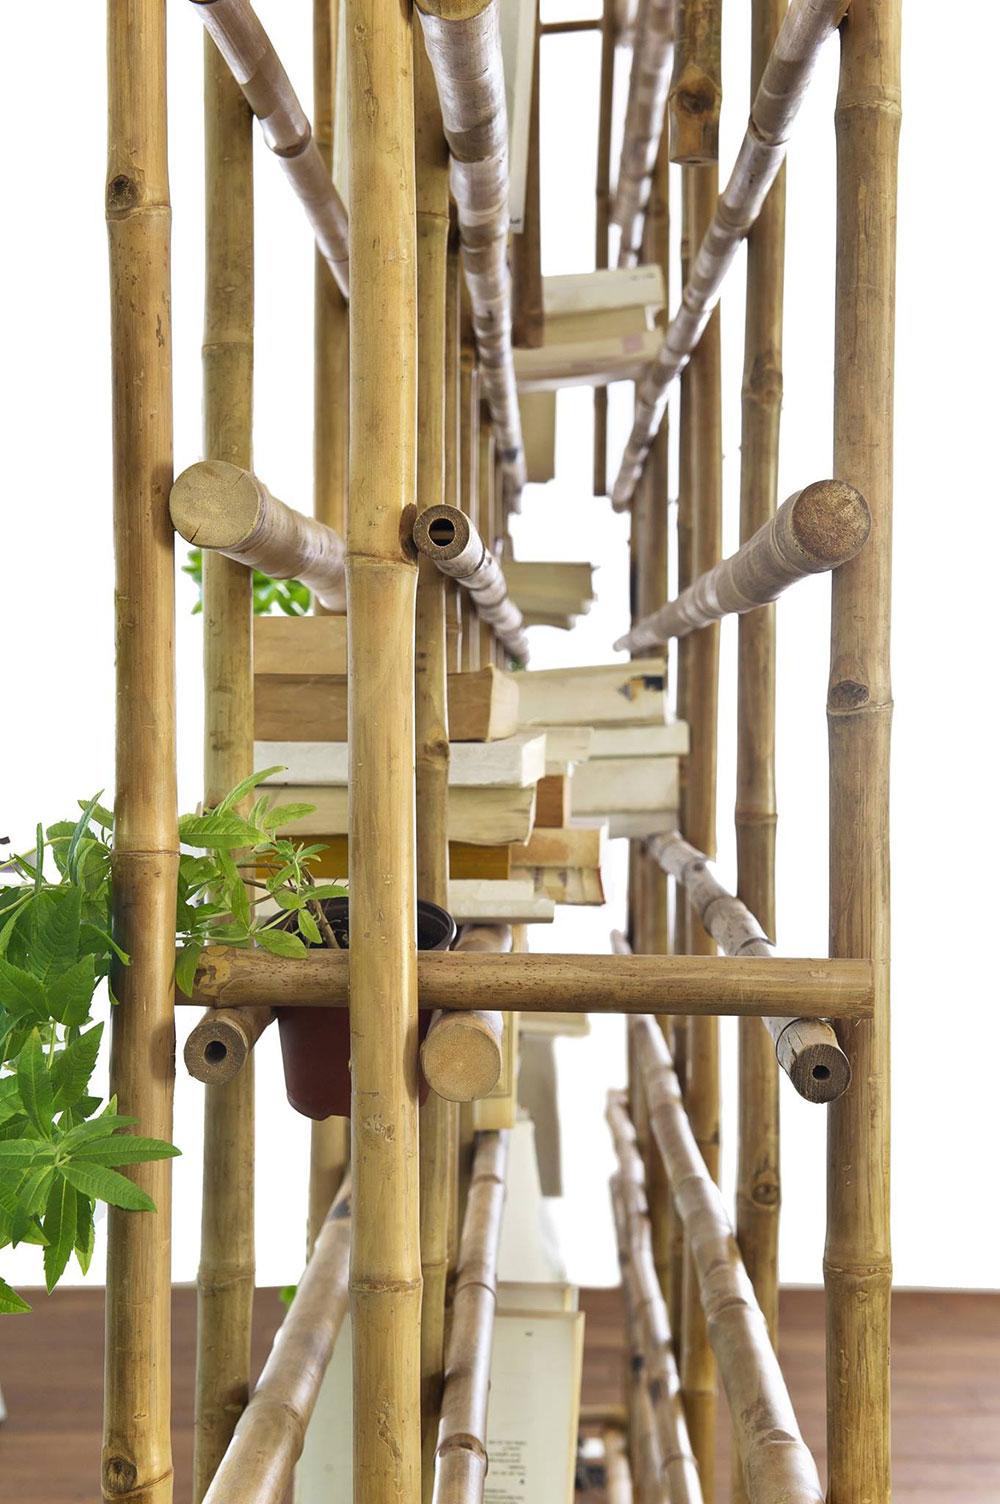 BambOOKS. מבט מהפרופיל